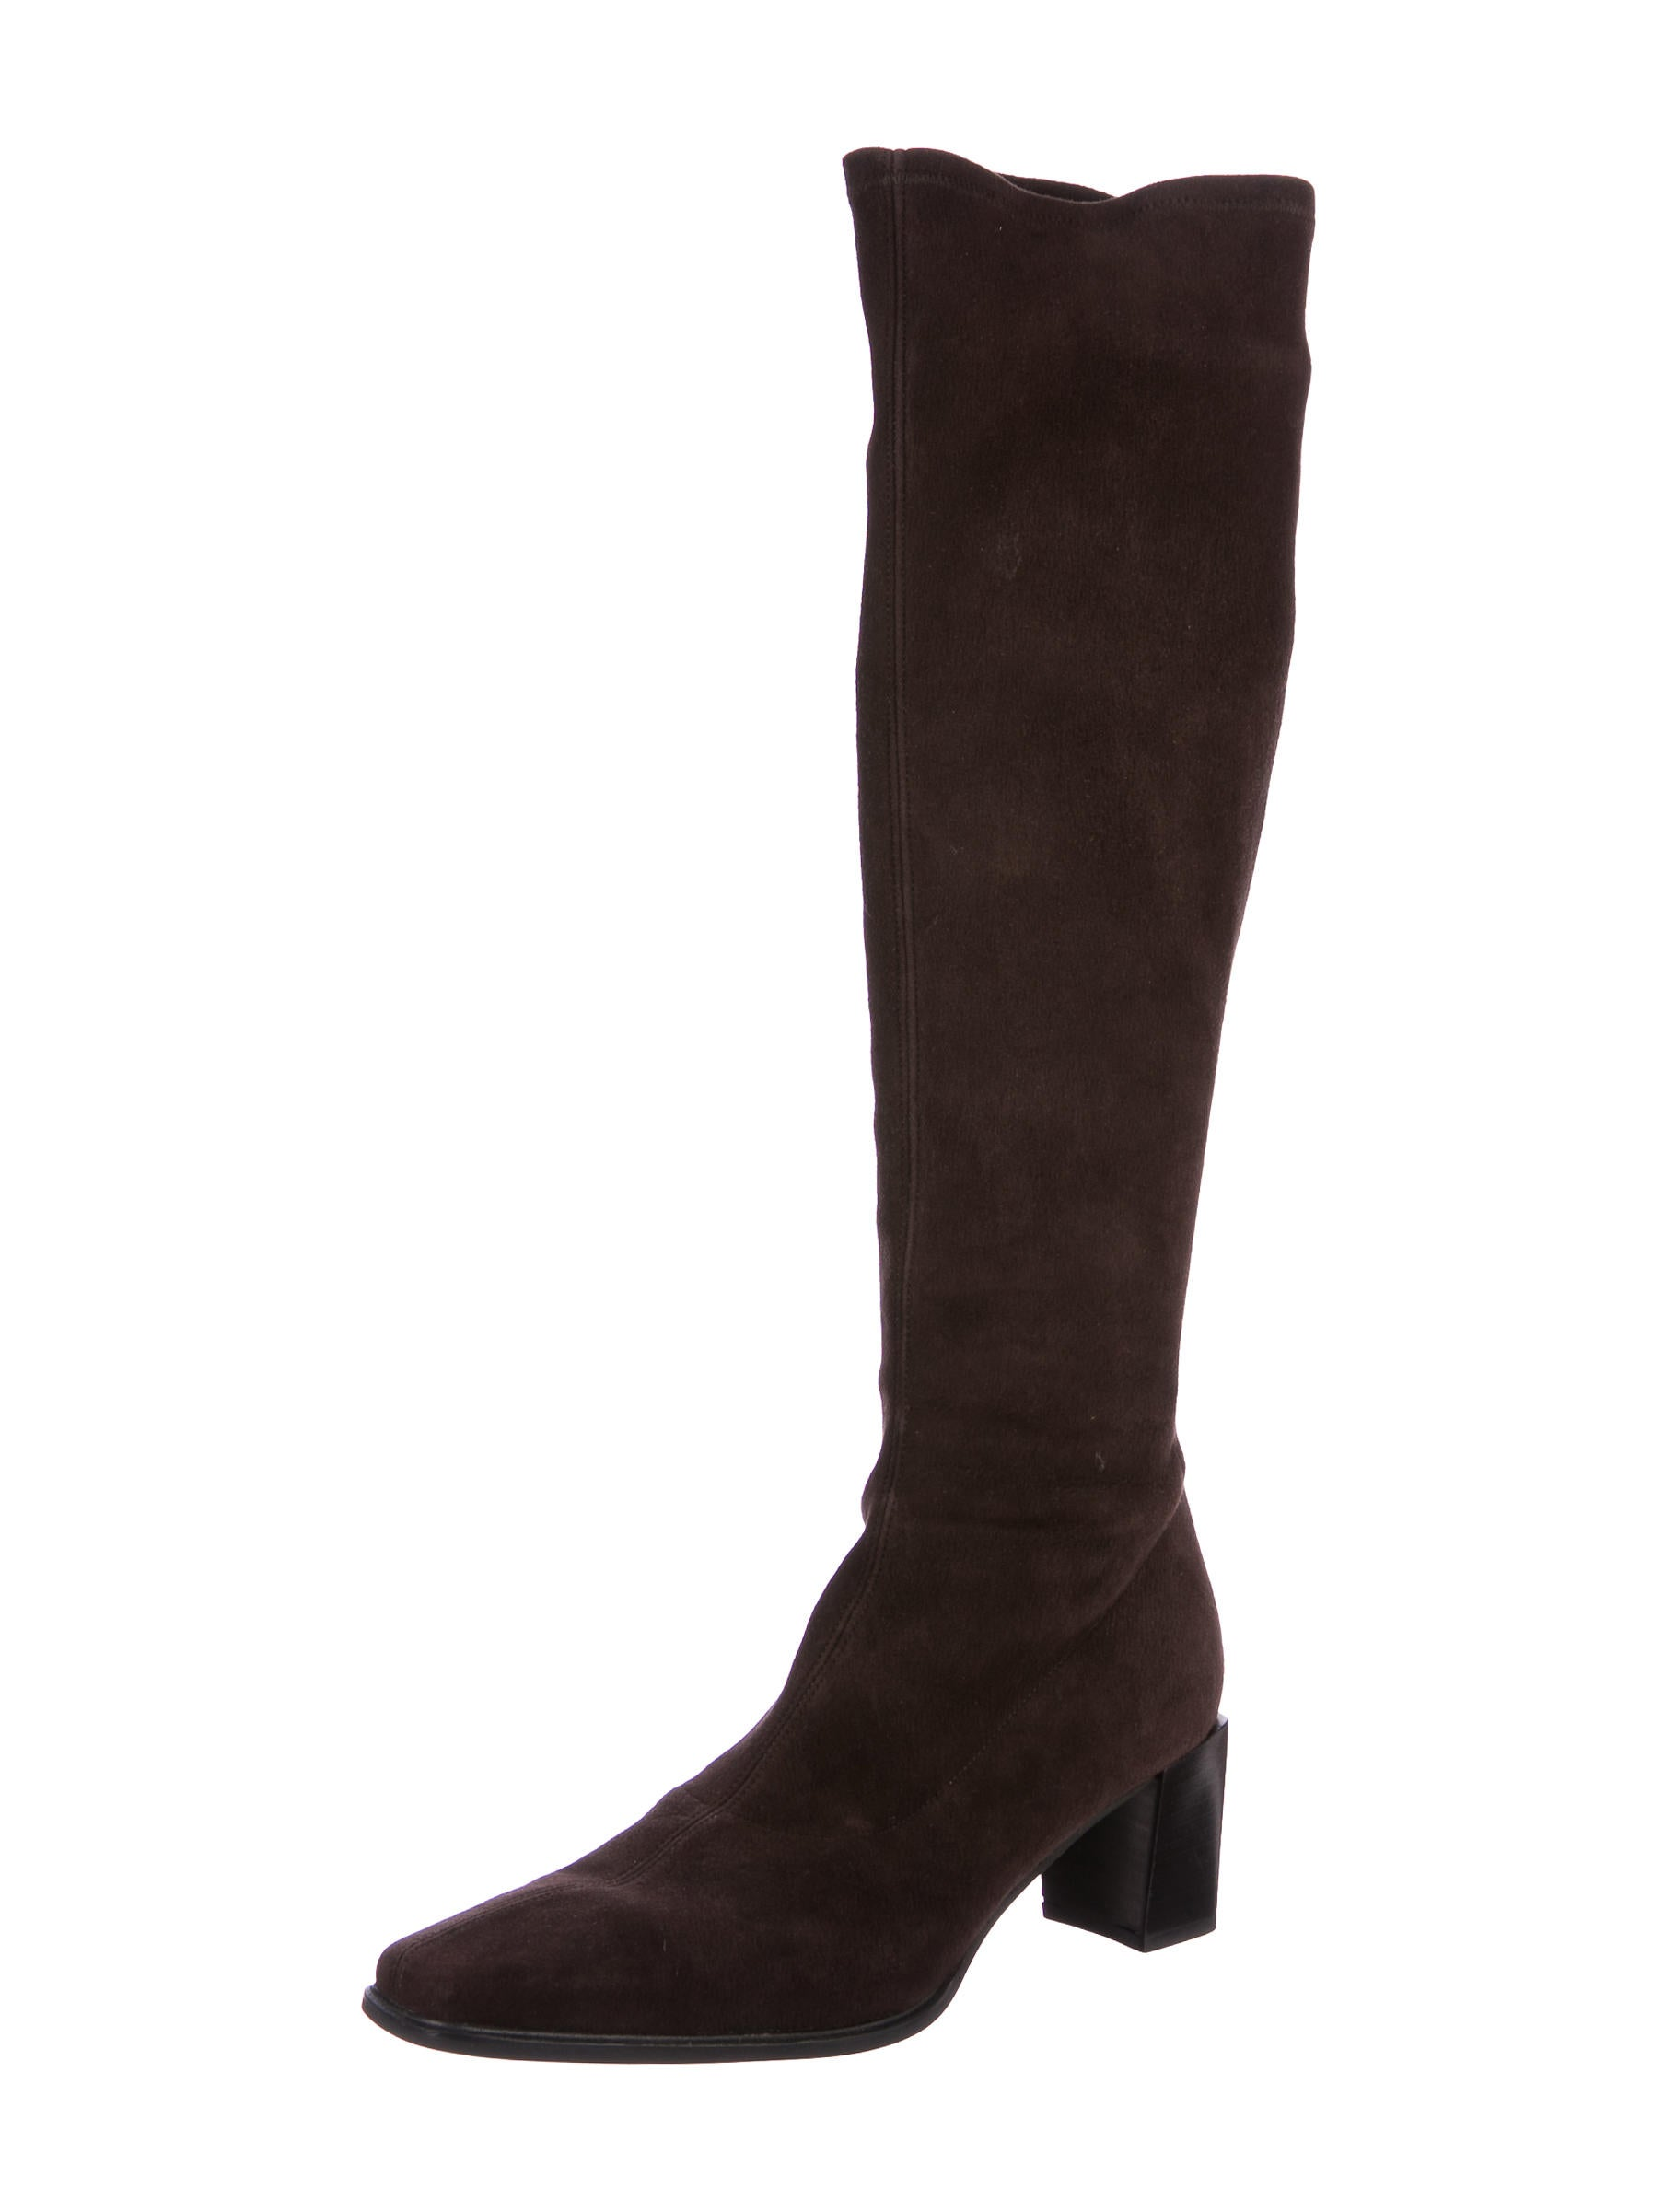 stuart weitzman suede knee high boots shoes wsu35830